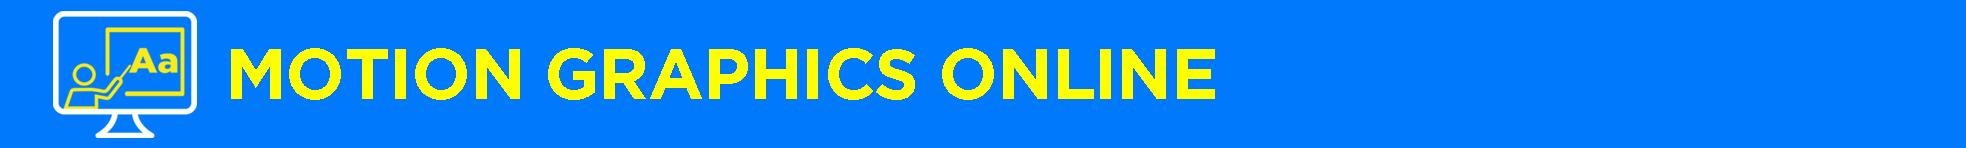 Banner título Motion Online